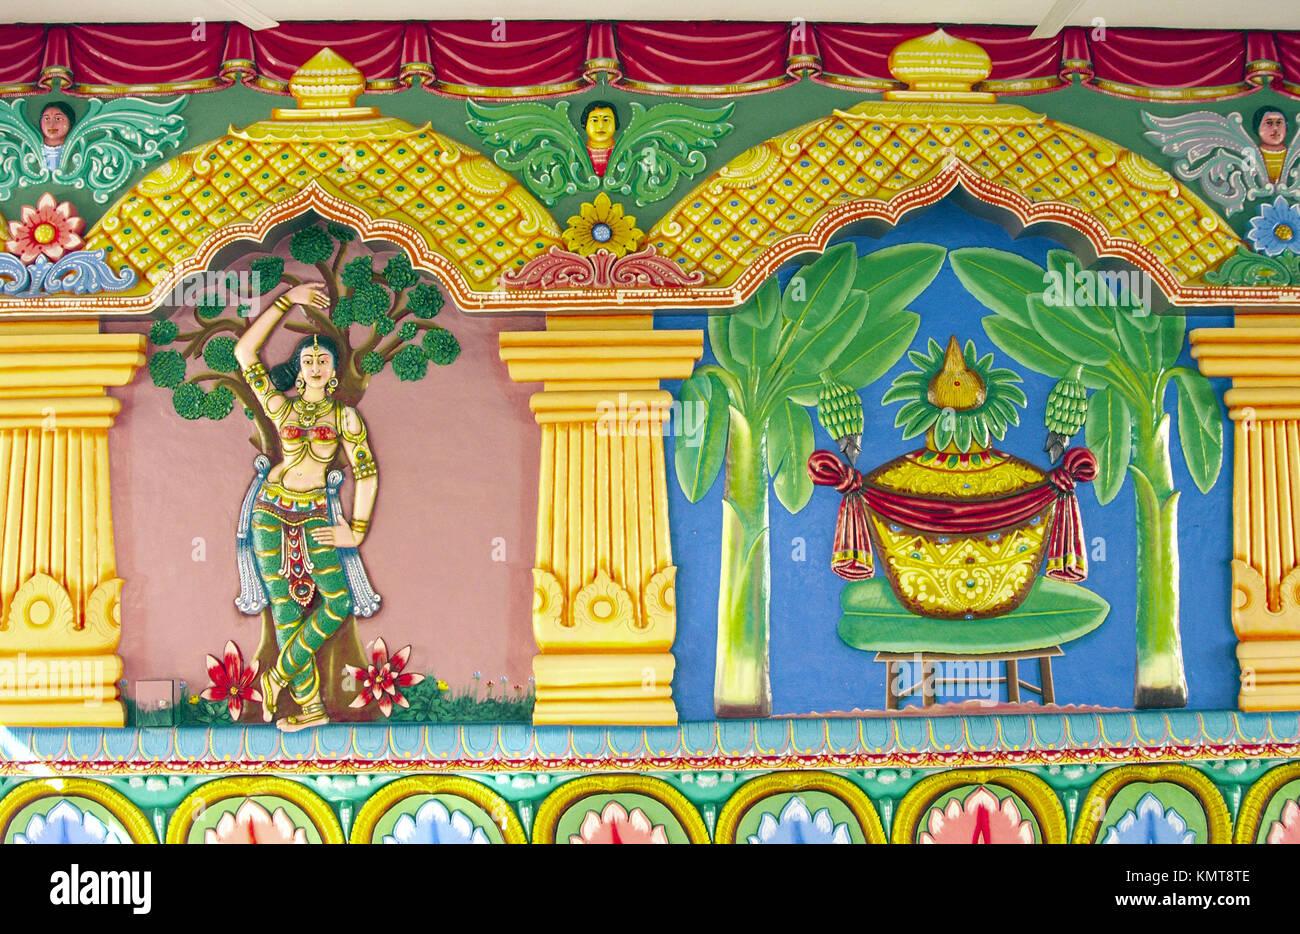 Colorful wall decor at the Sri Srinivasa Perumal Hindu Temple in ...